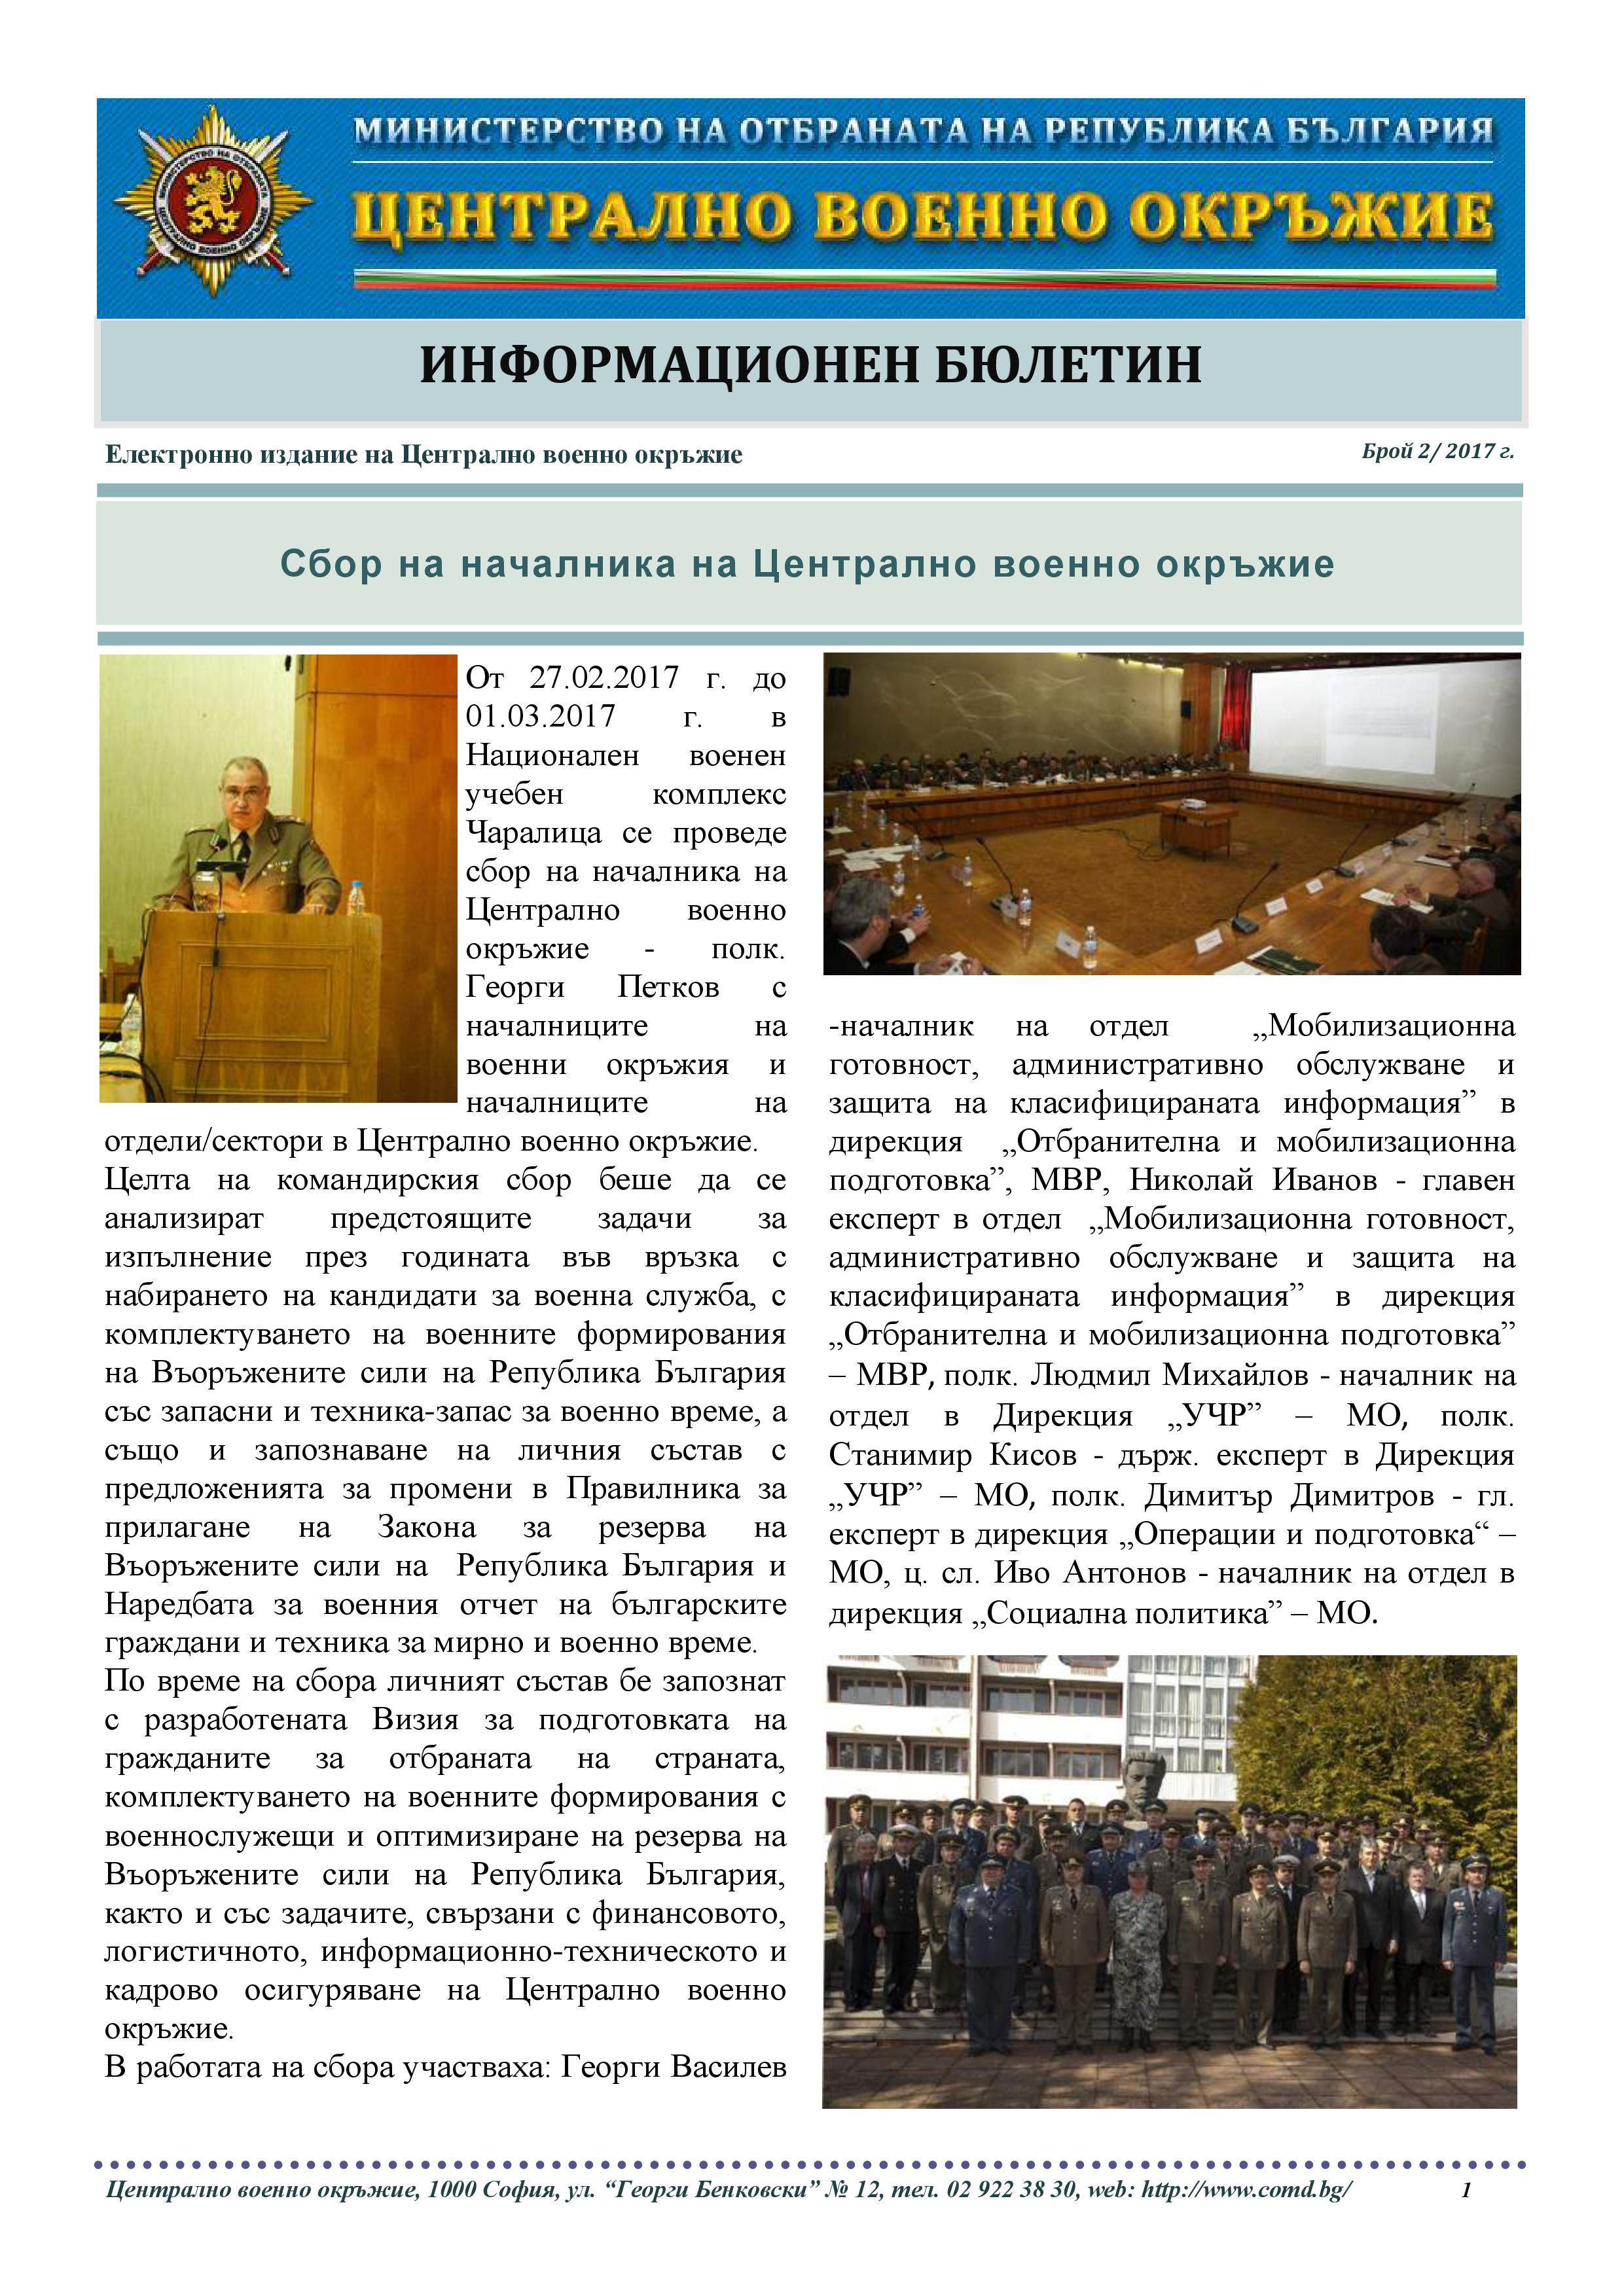 http://armymedia.bg/wp-content/uploads/2015/06/IB_2_2017g.compressed-za-izpra6tane-22.03.2017.page01.jpg